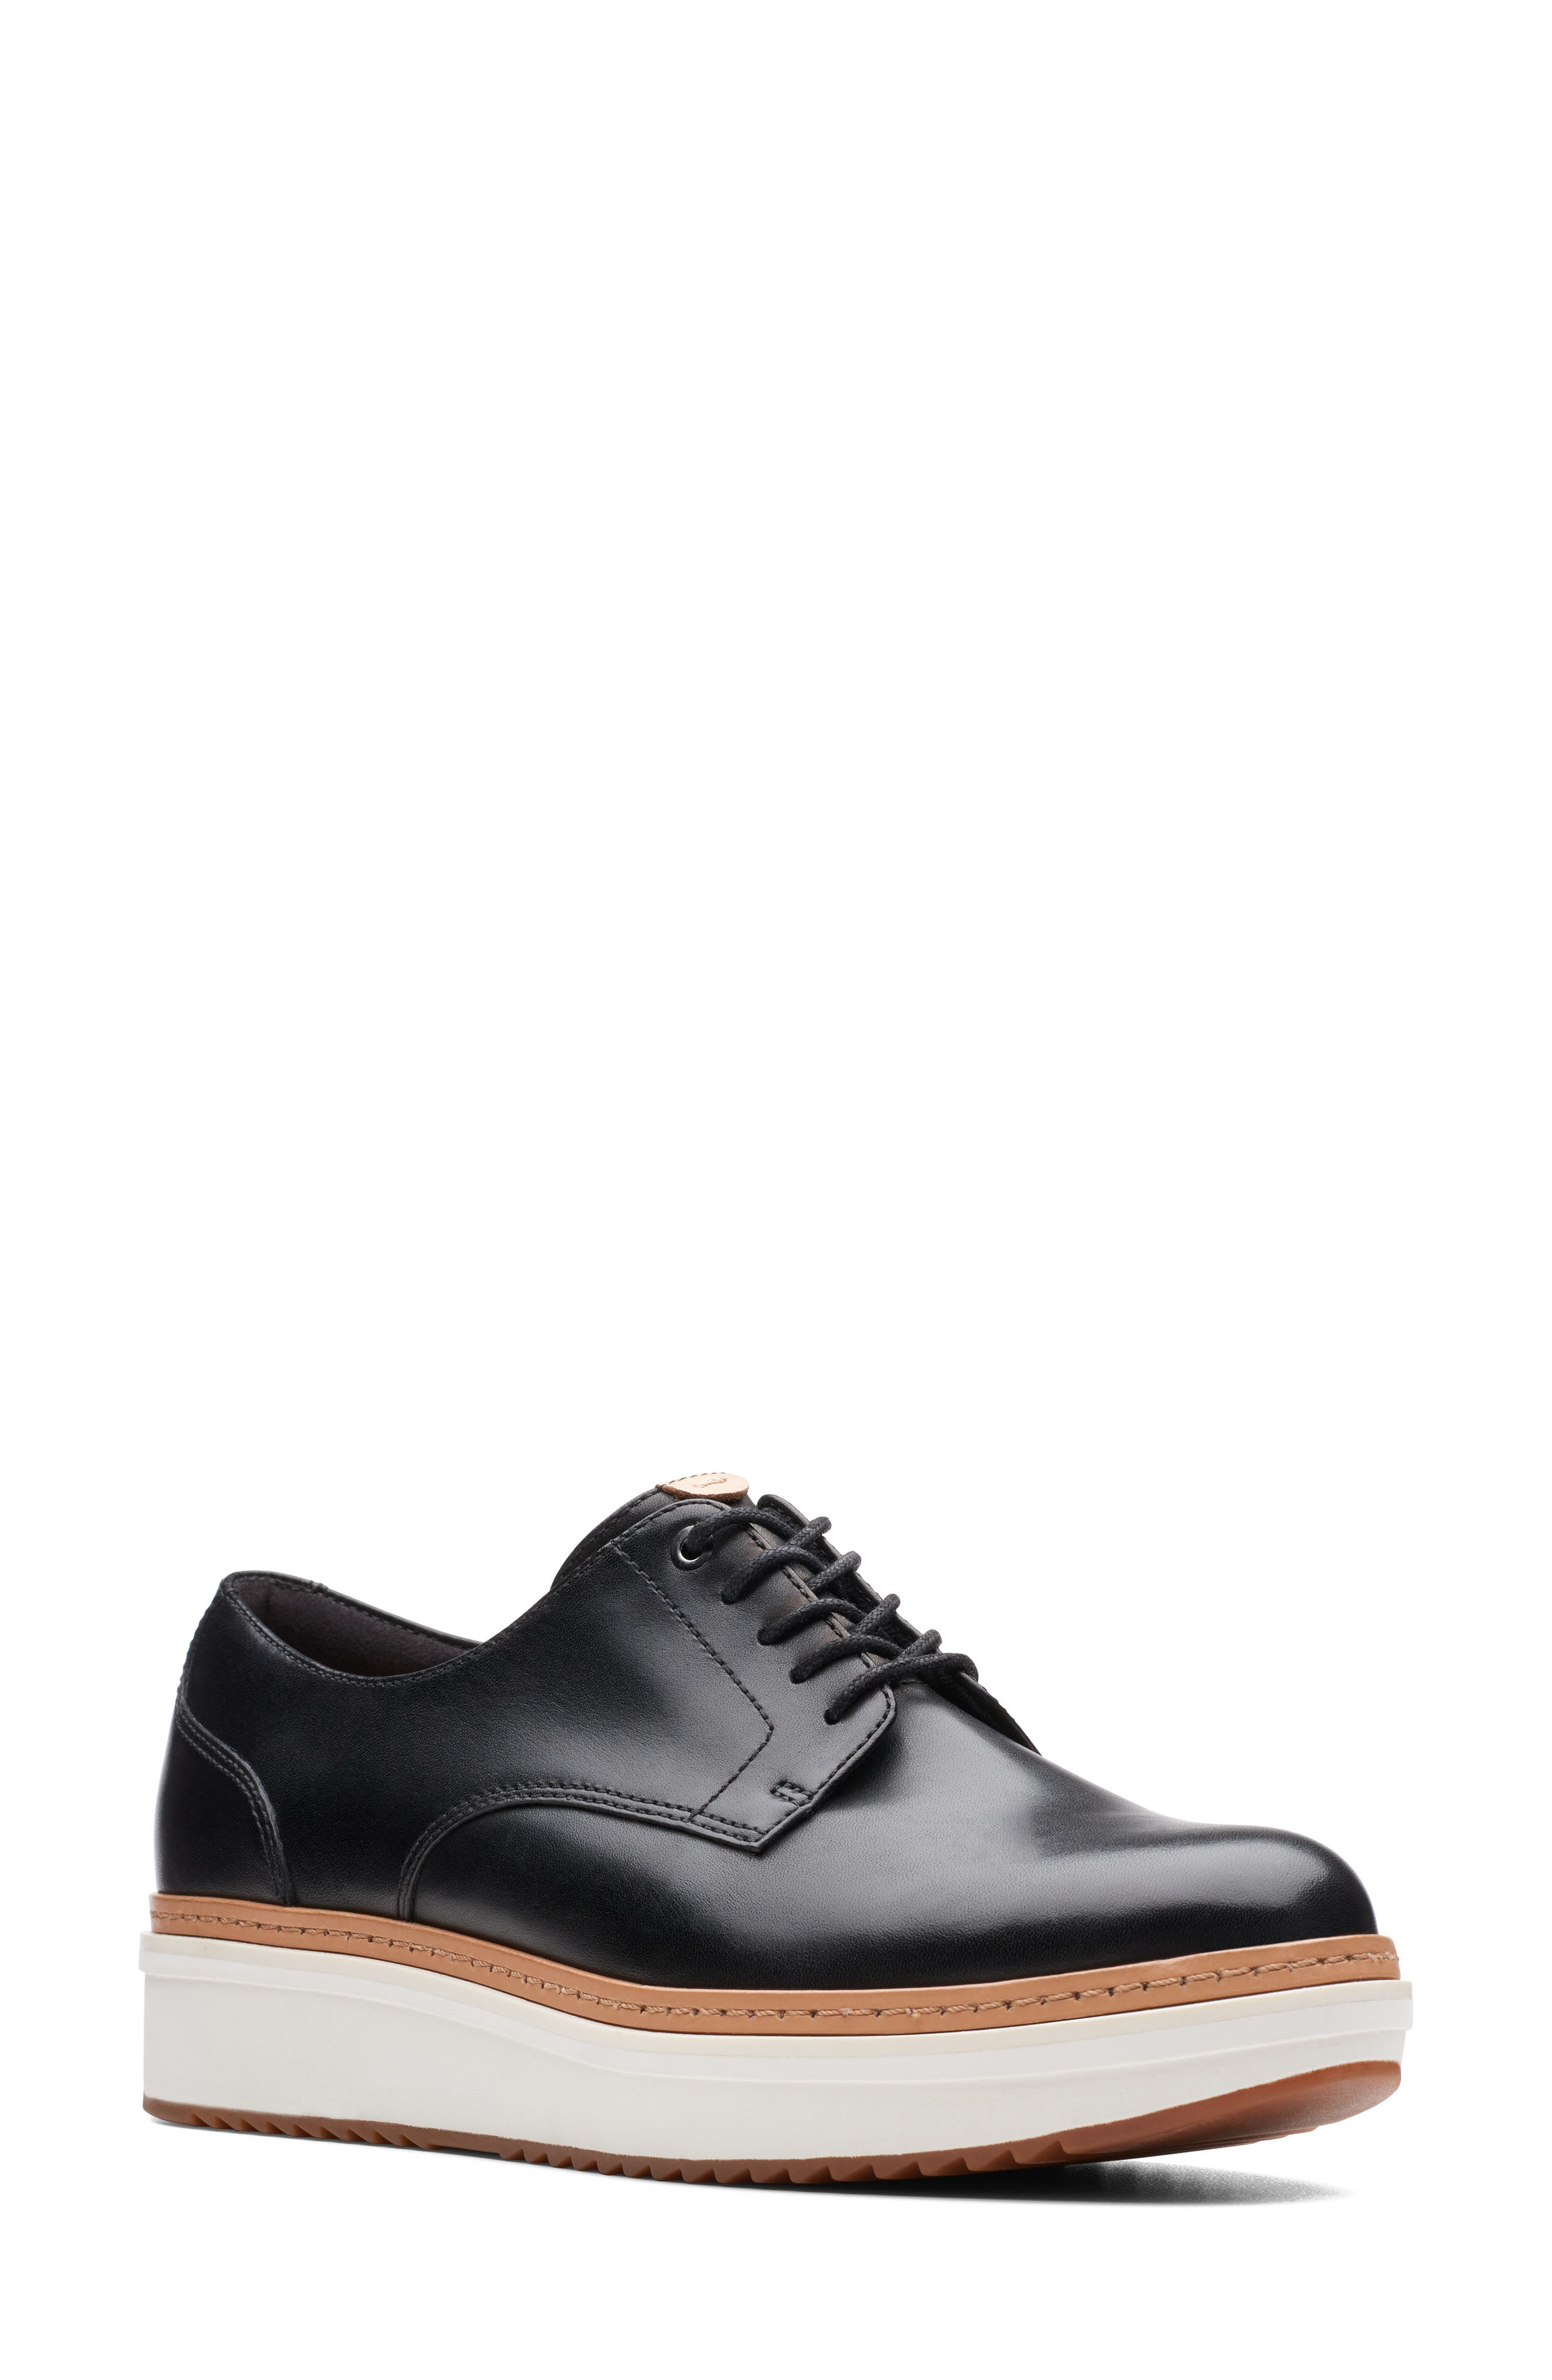 73d6eeeb6 Clarks Shoes